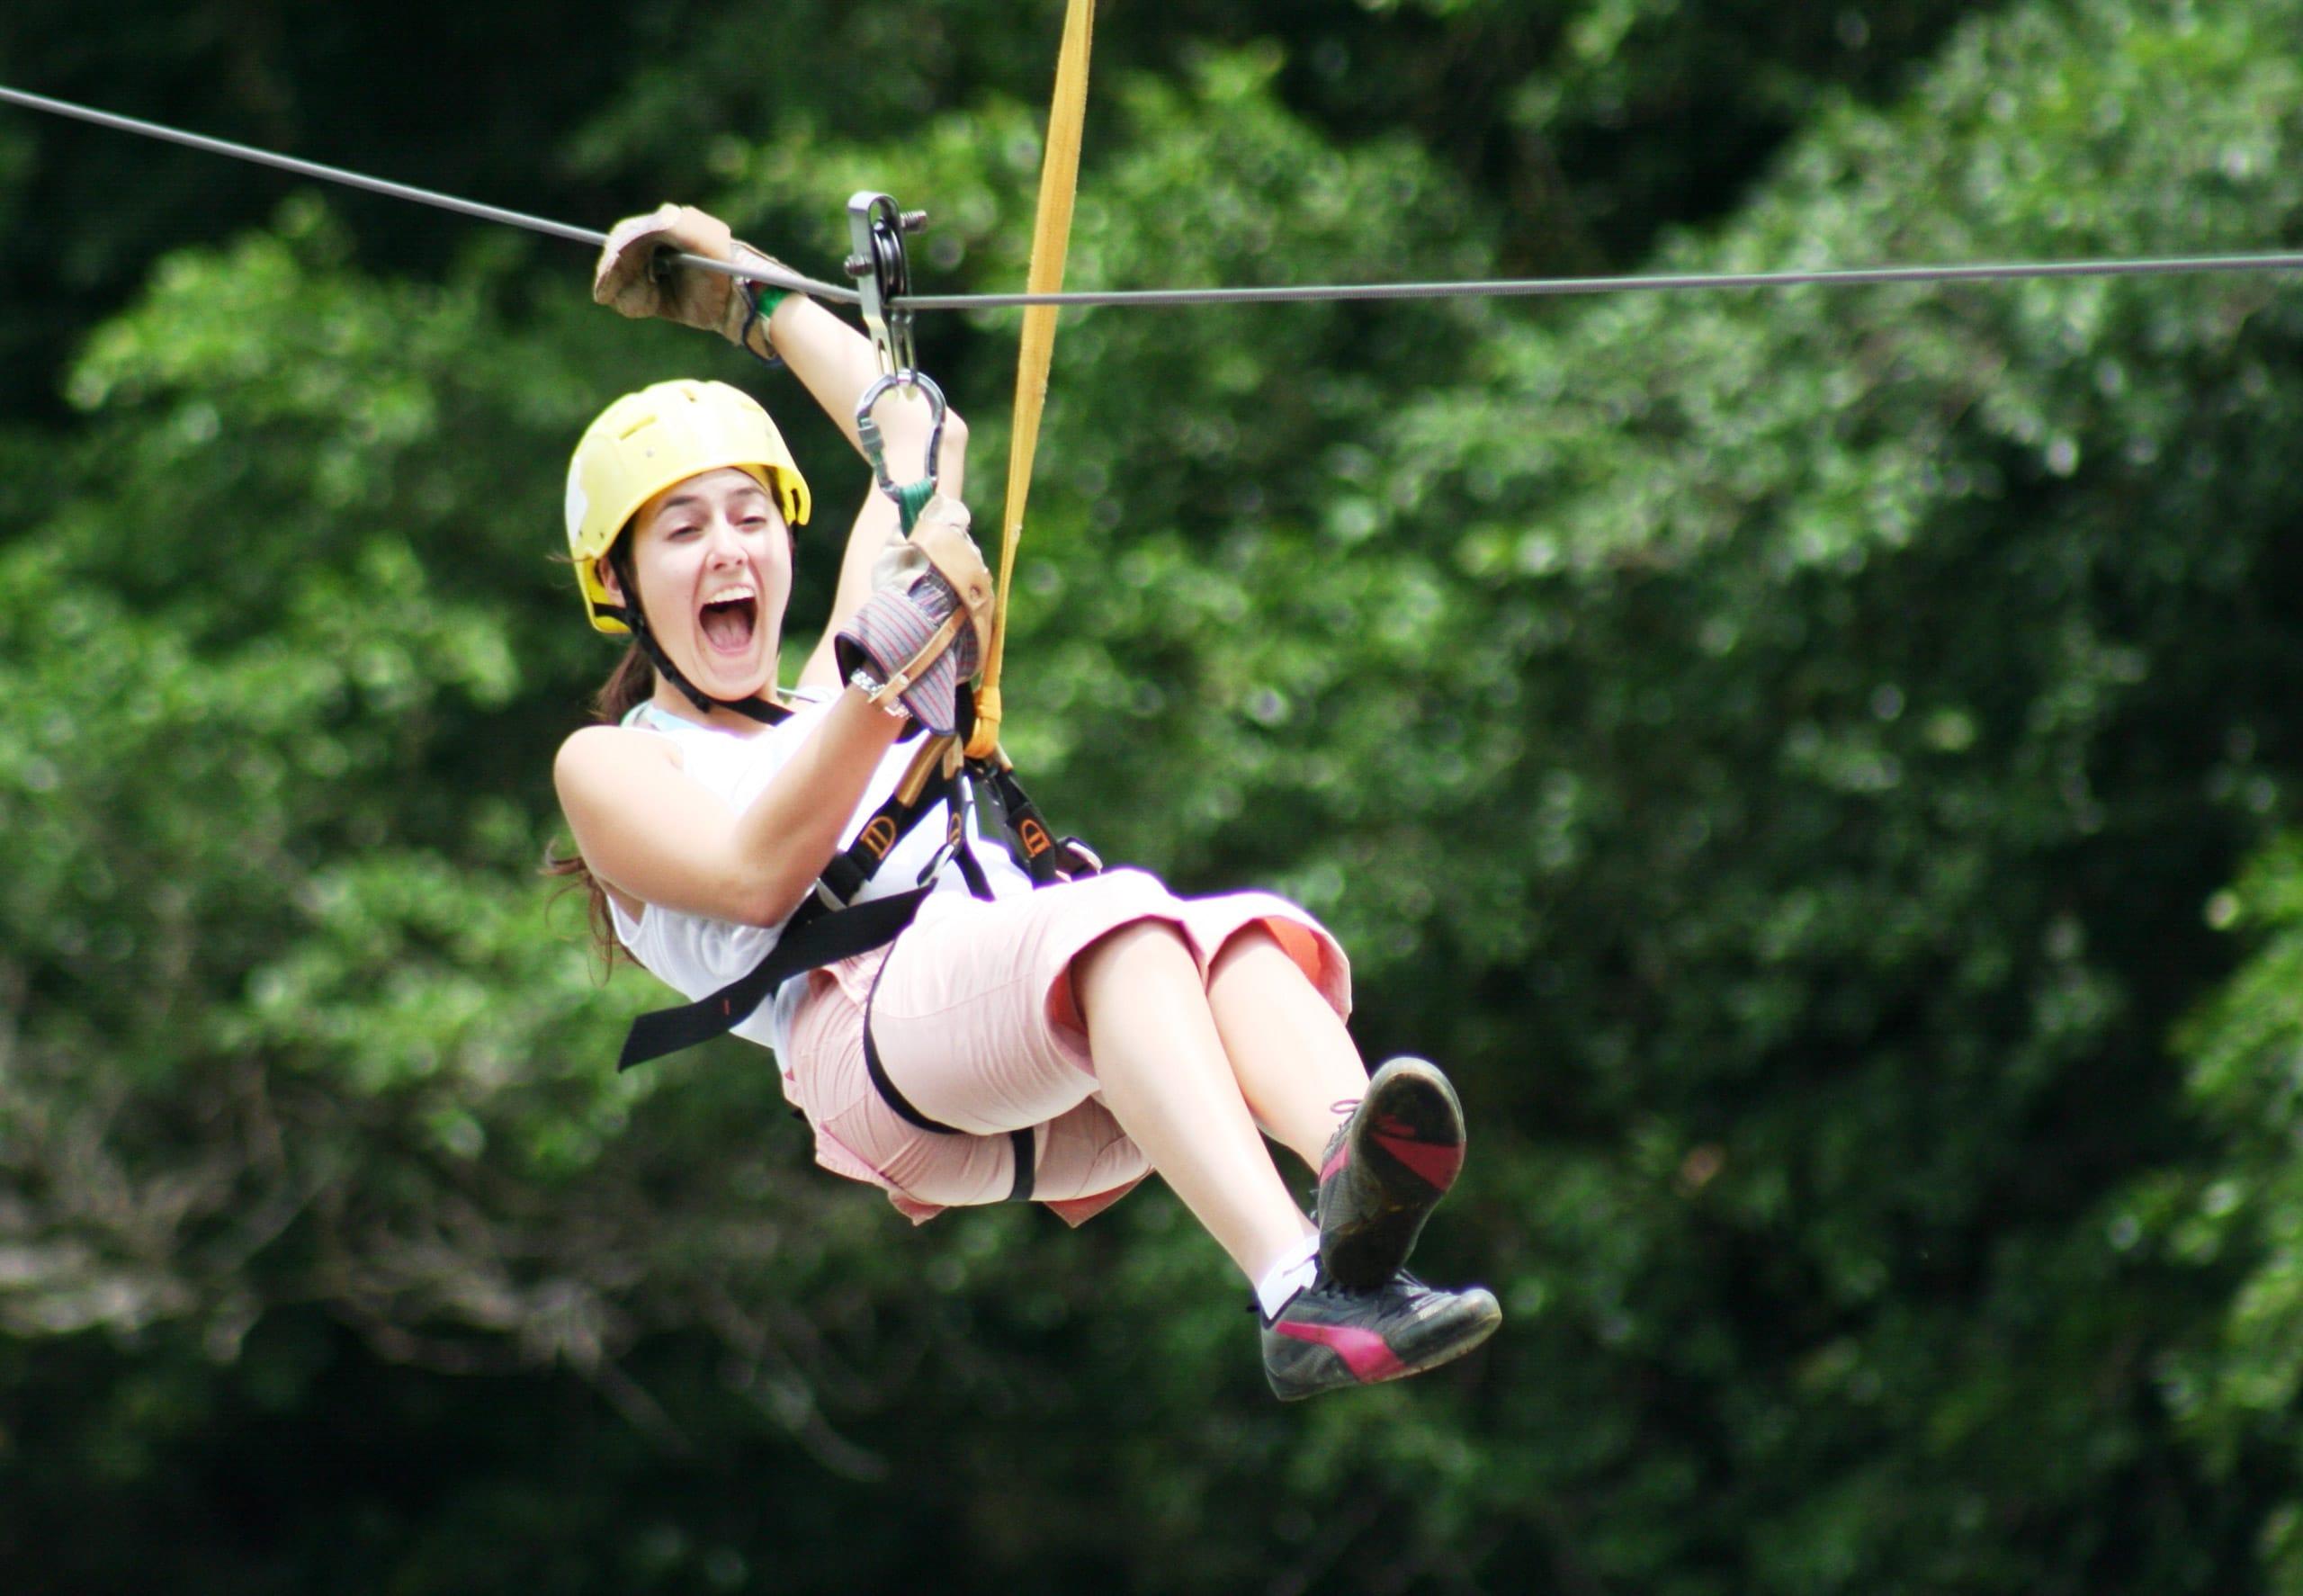 14-daagse familie groepsreis Boomslingeren als Tarzan met Lufthansa